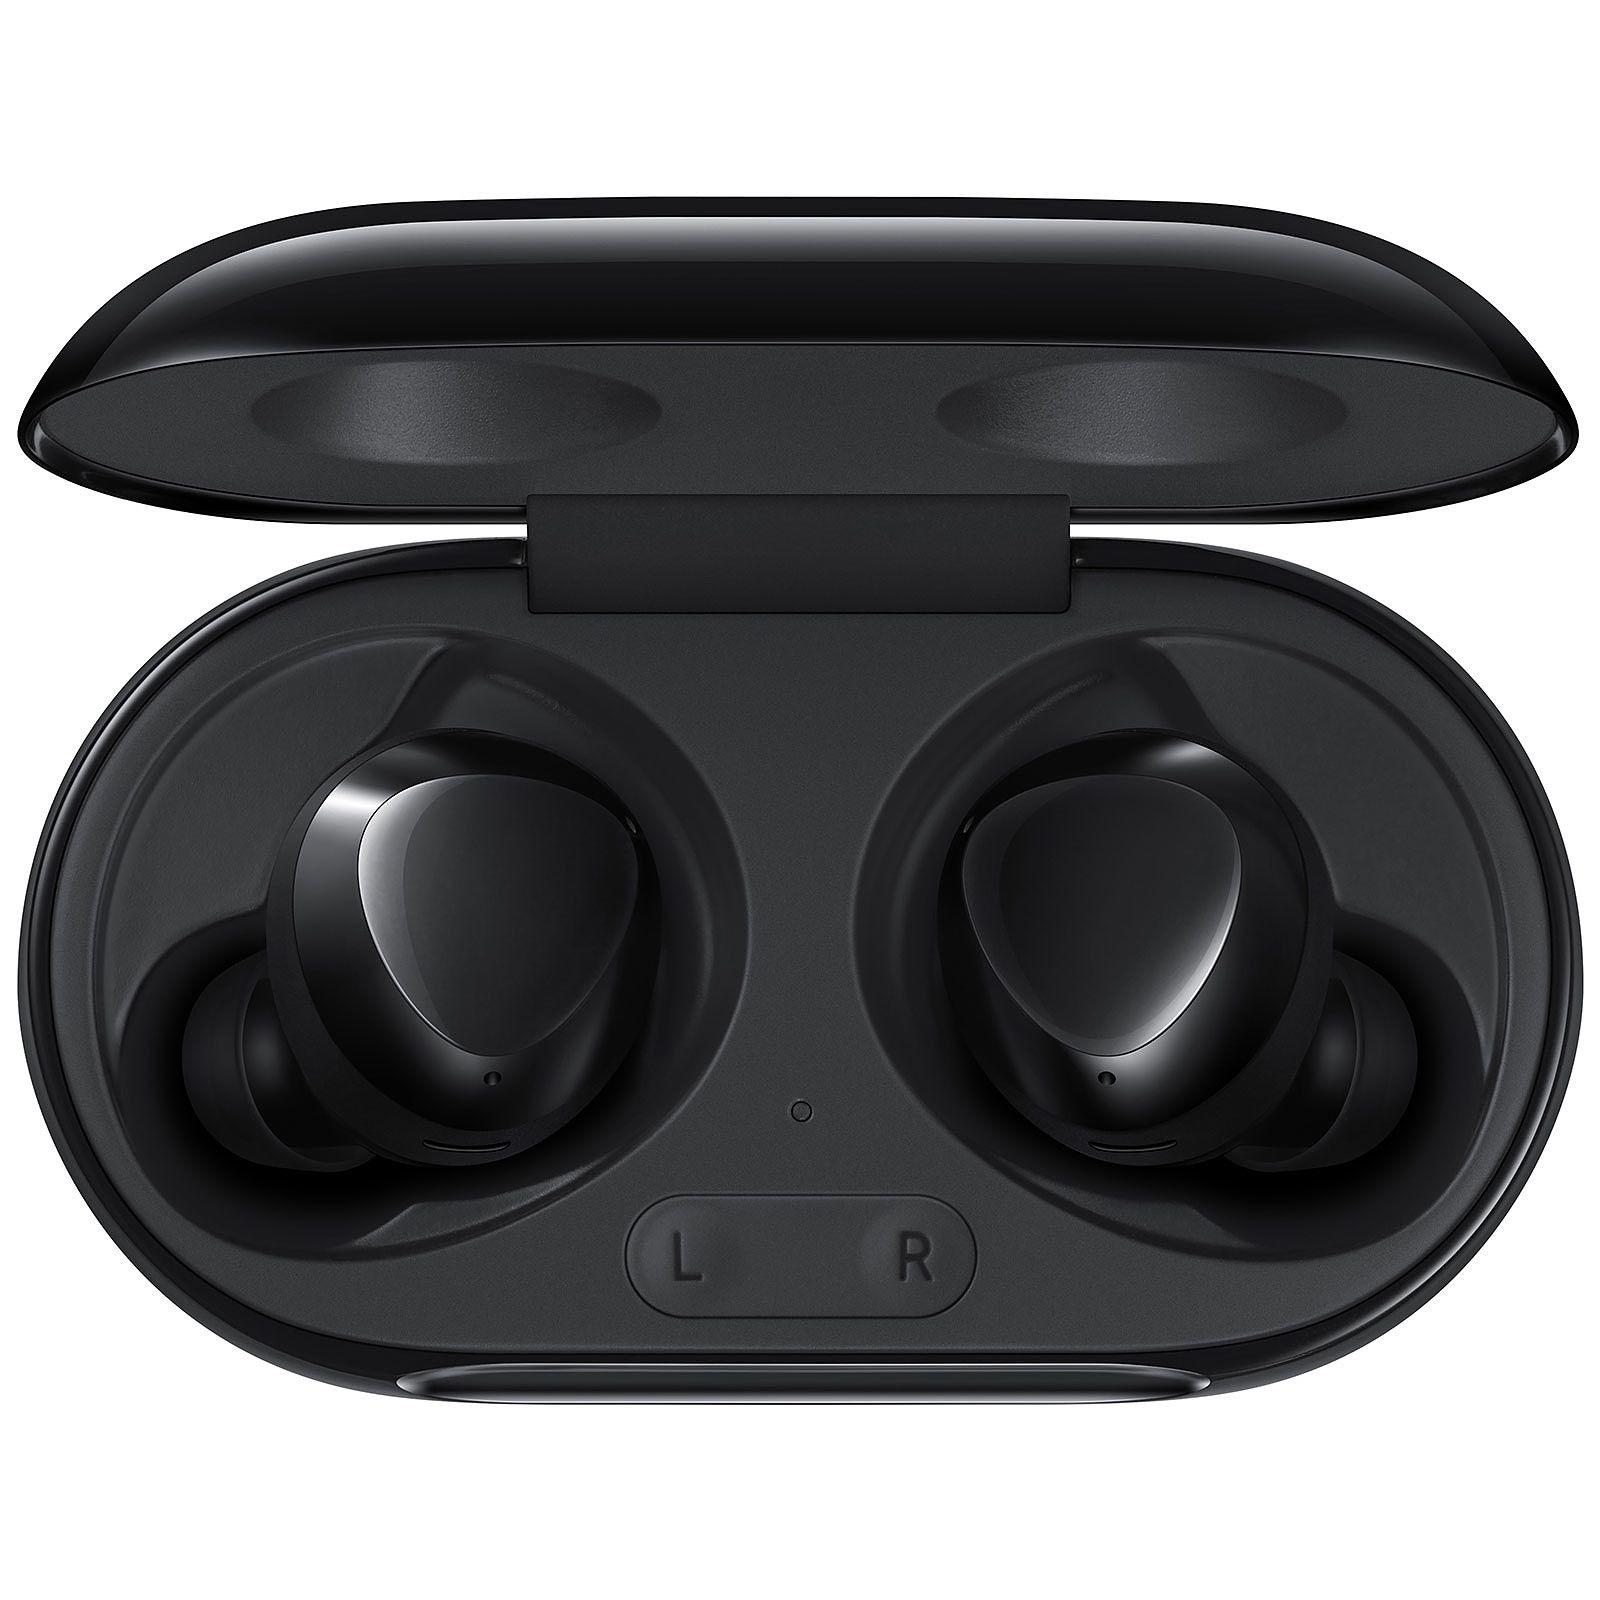 Samsung Galaxy Buds Plus: Kabellose Kopfhörer (11h Akku, AKG Treiber, 3 Mikrofone, SM-R175)